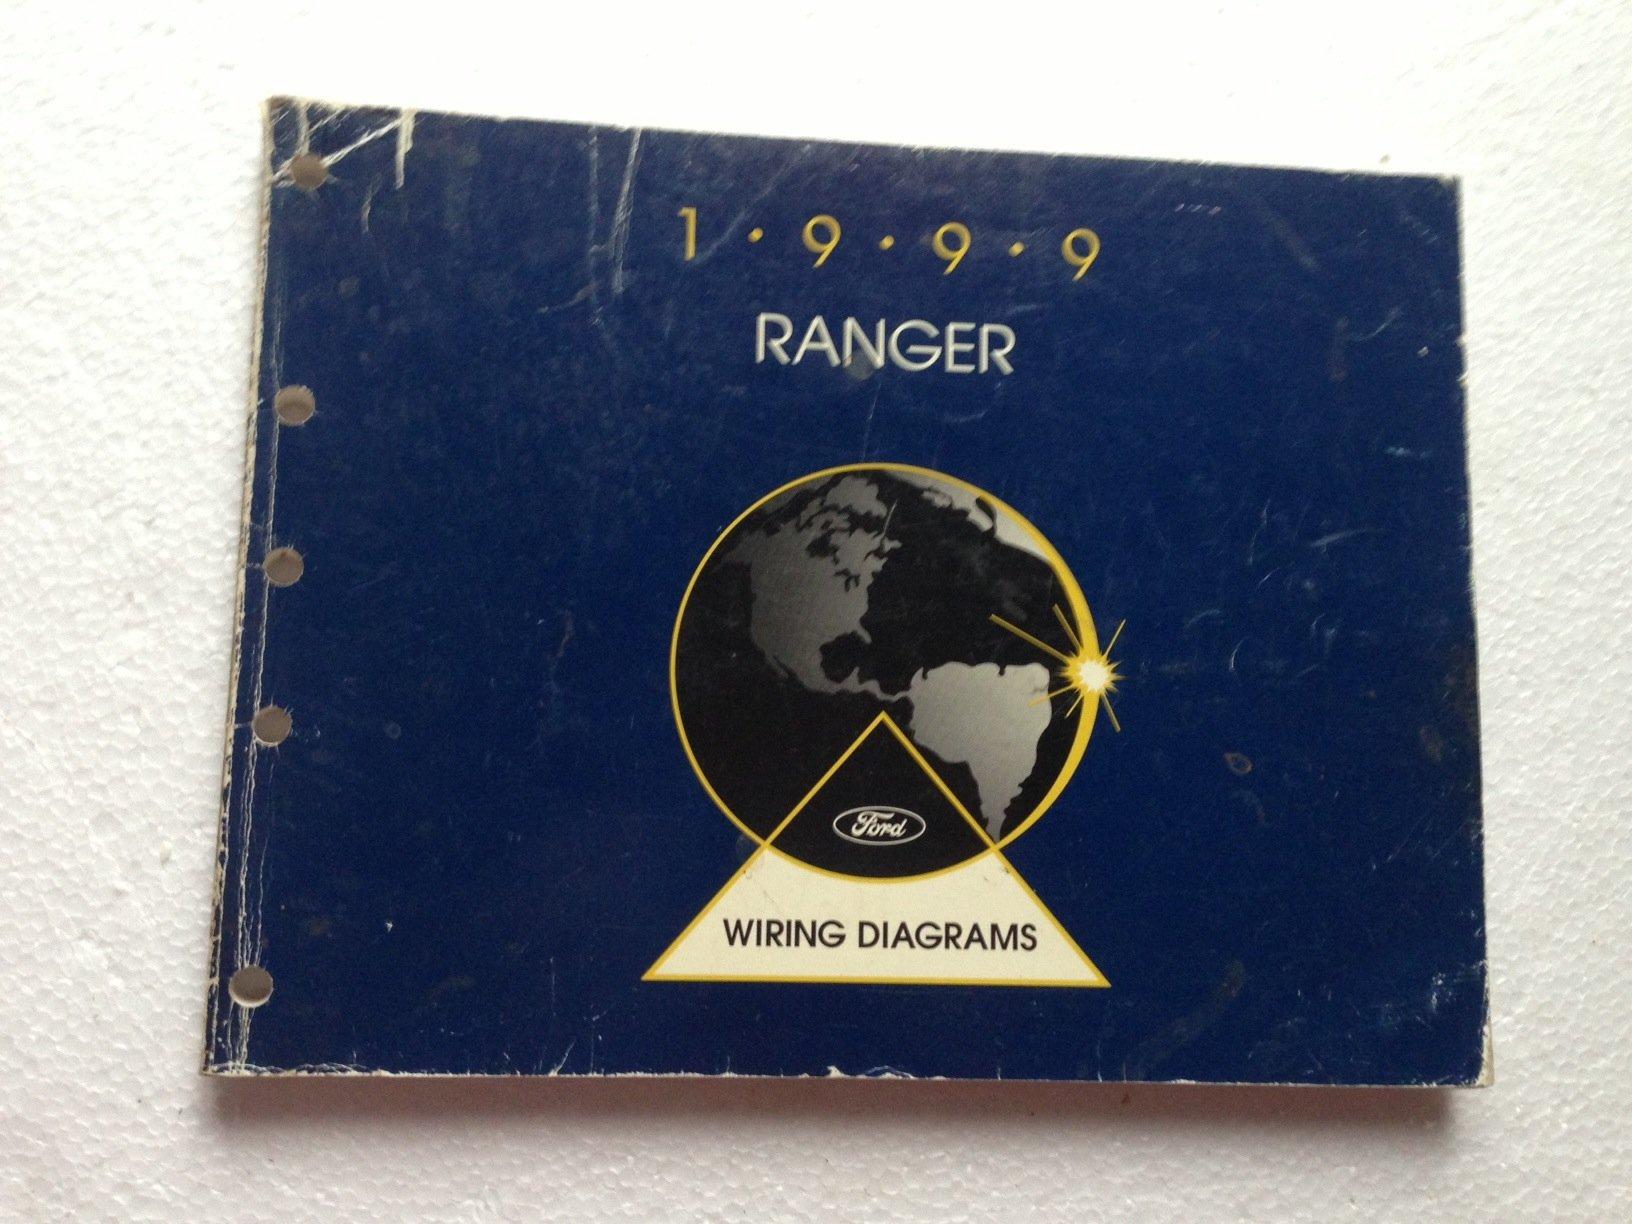 99 Ranger Fuse Diagram - Wiring Diagram Networks